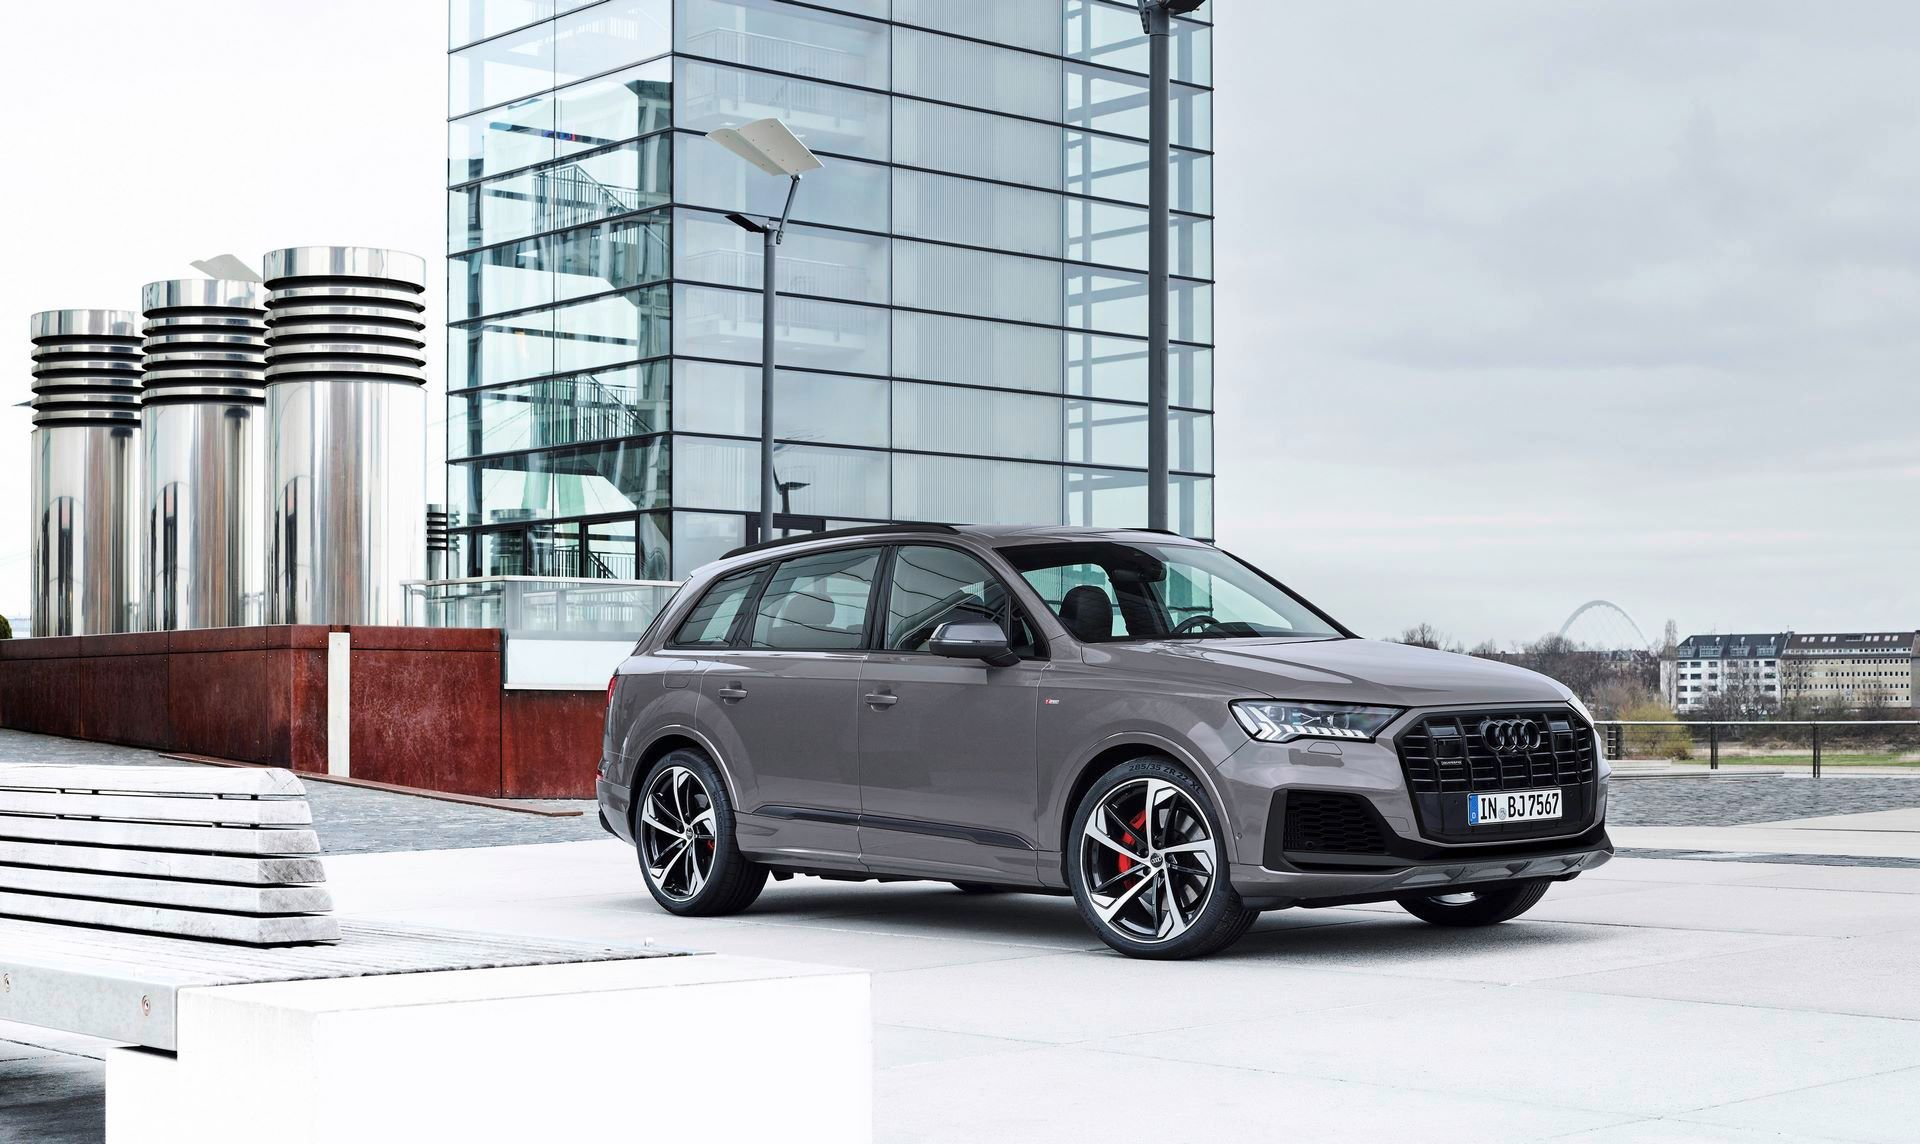 Audi-A4-A5-Q7-Q8-Competition-And-Competition-Plus-Trims-36